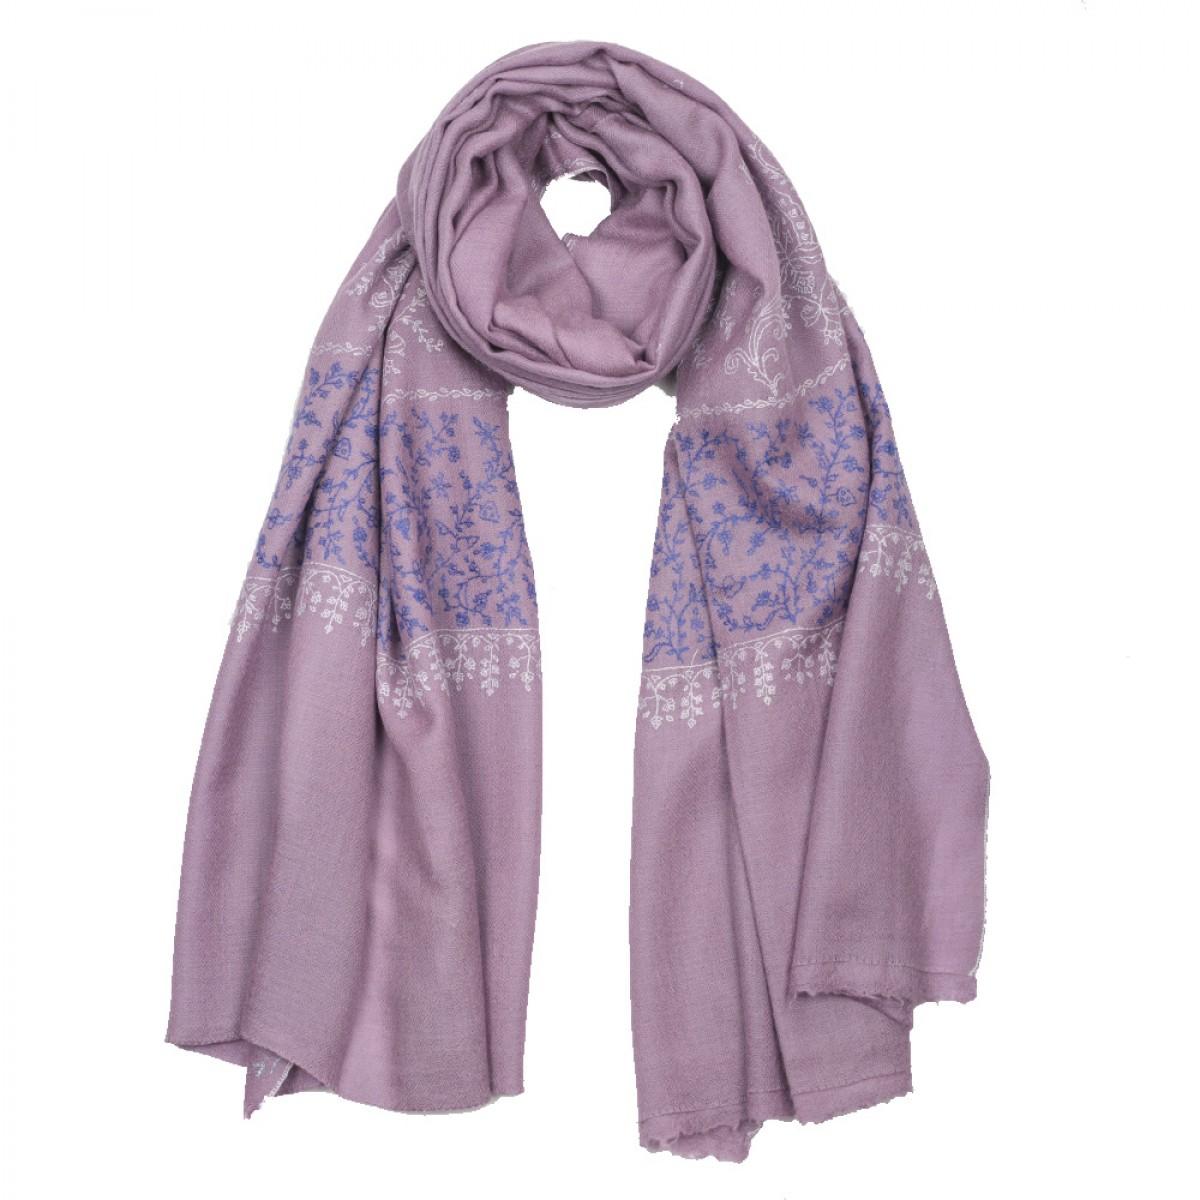 Hand Embroidered Cashmere Pashmina Stole - Mauve Purple